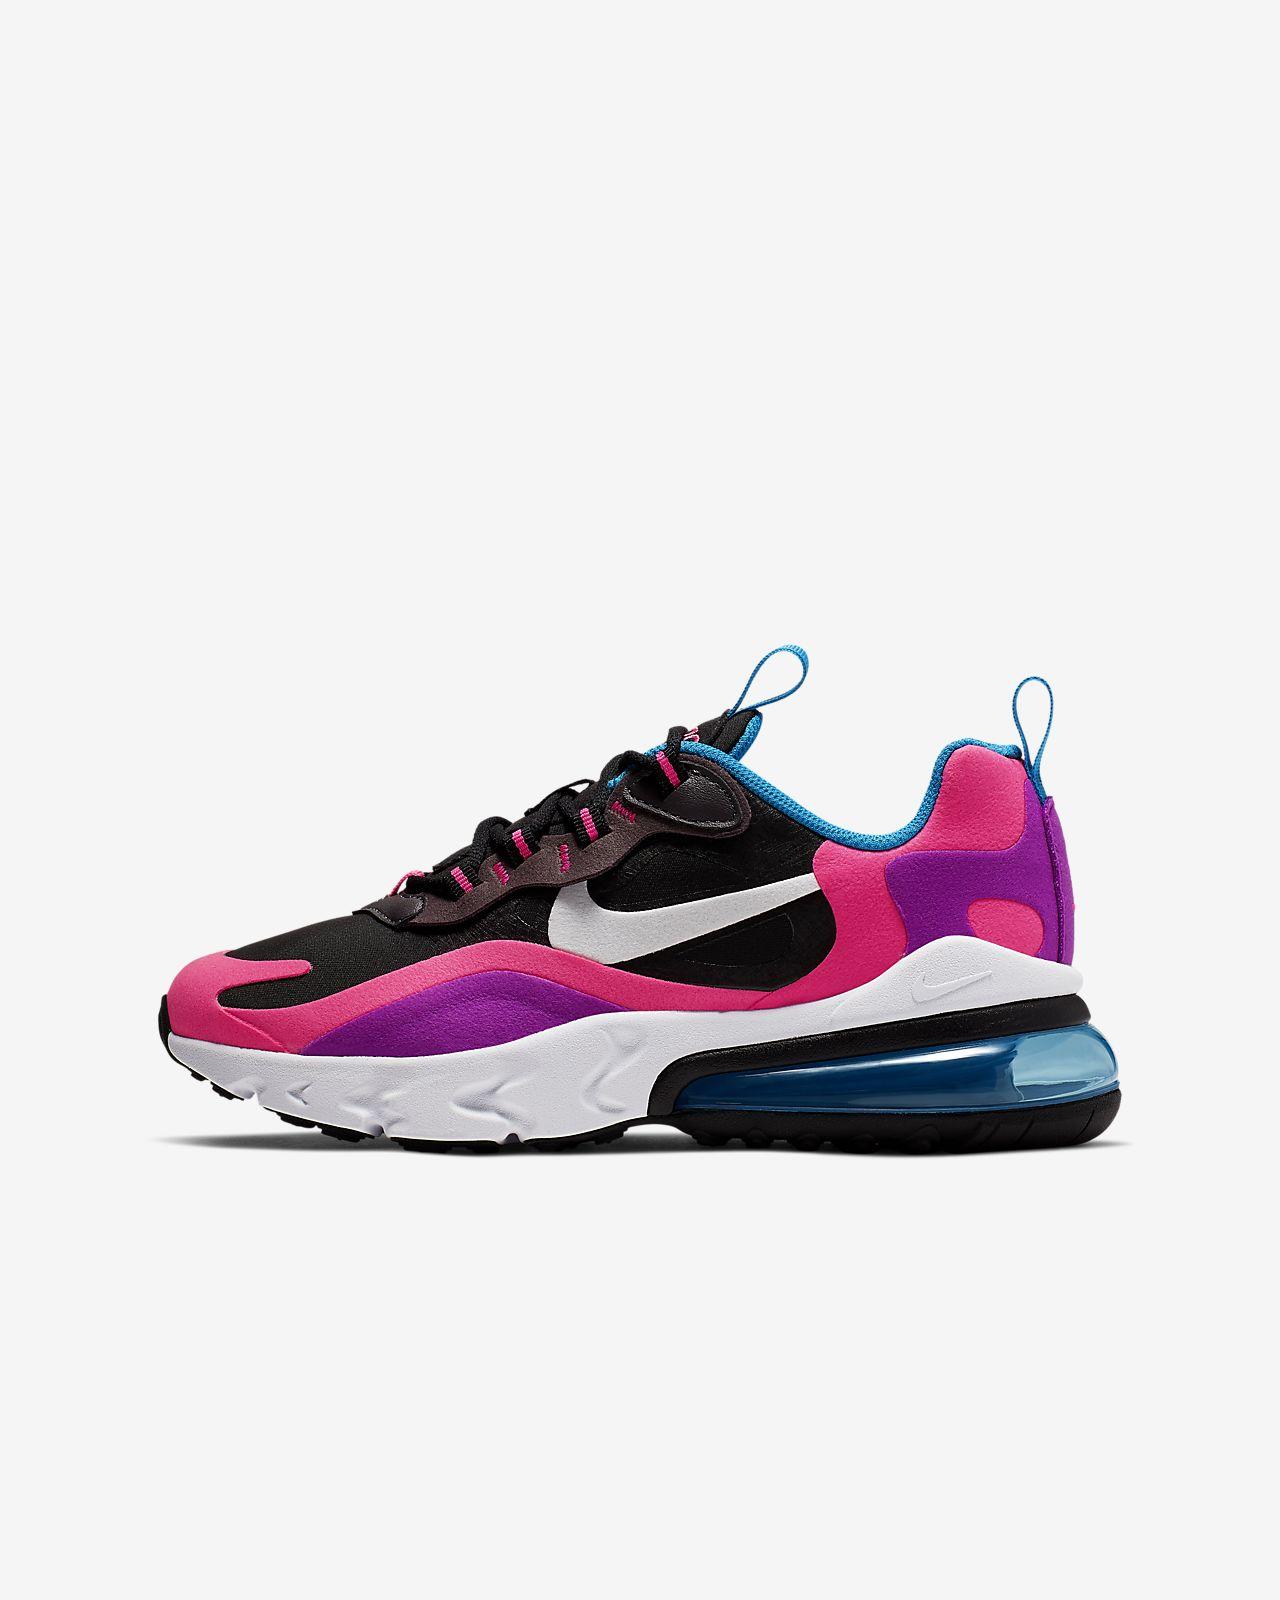 low priced 3084e 82500 Nike Air Max 270 React Older Kids' Shoe